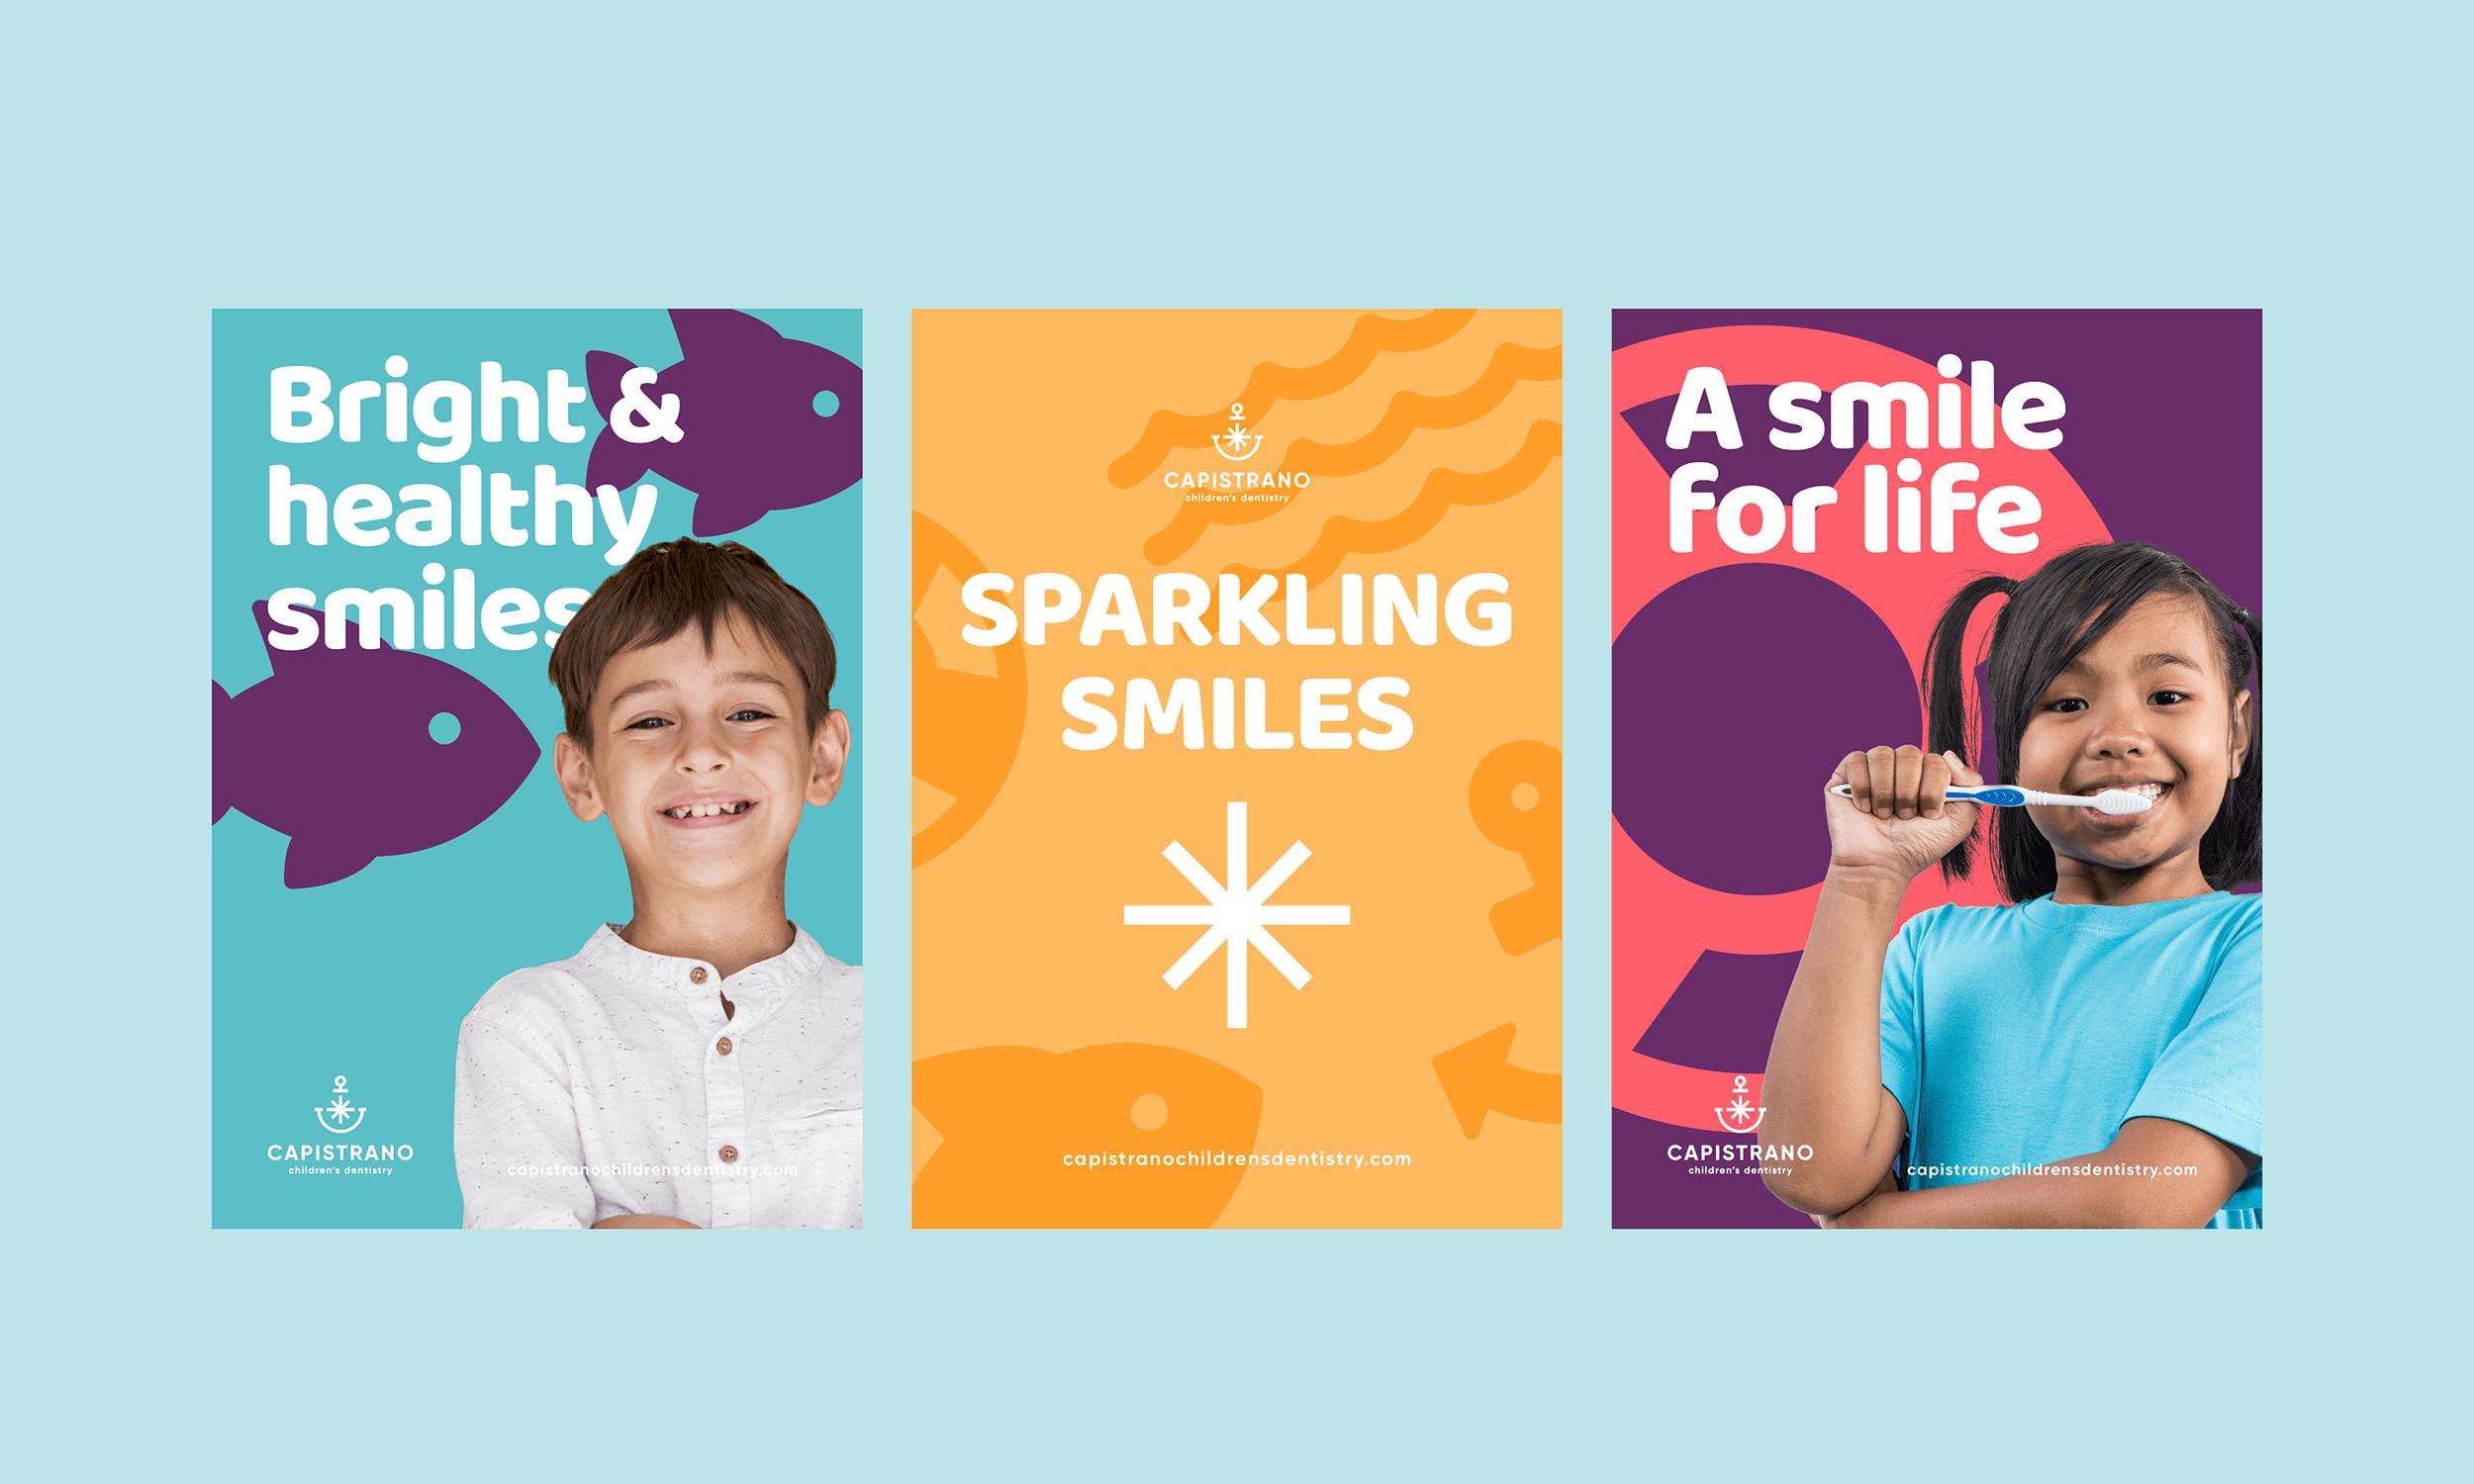 Capistrano-Childrens-Dentistry-Logo-Design-Freelance-Graphic-Designer-Margate-Kent-Presentation-Pediatric-Dental-Adverts